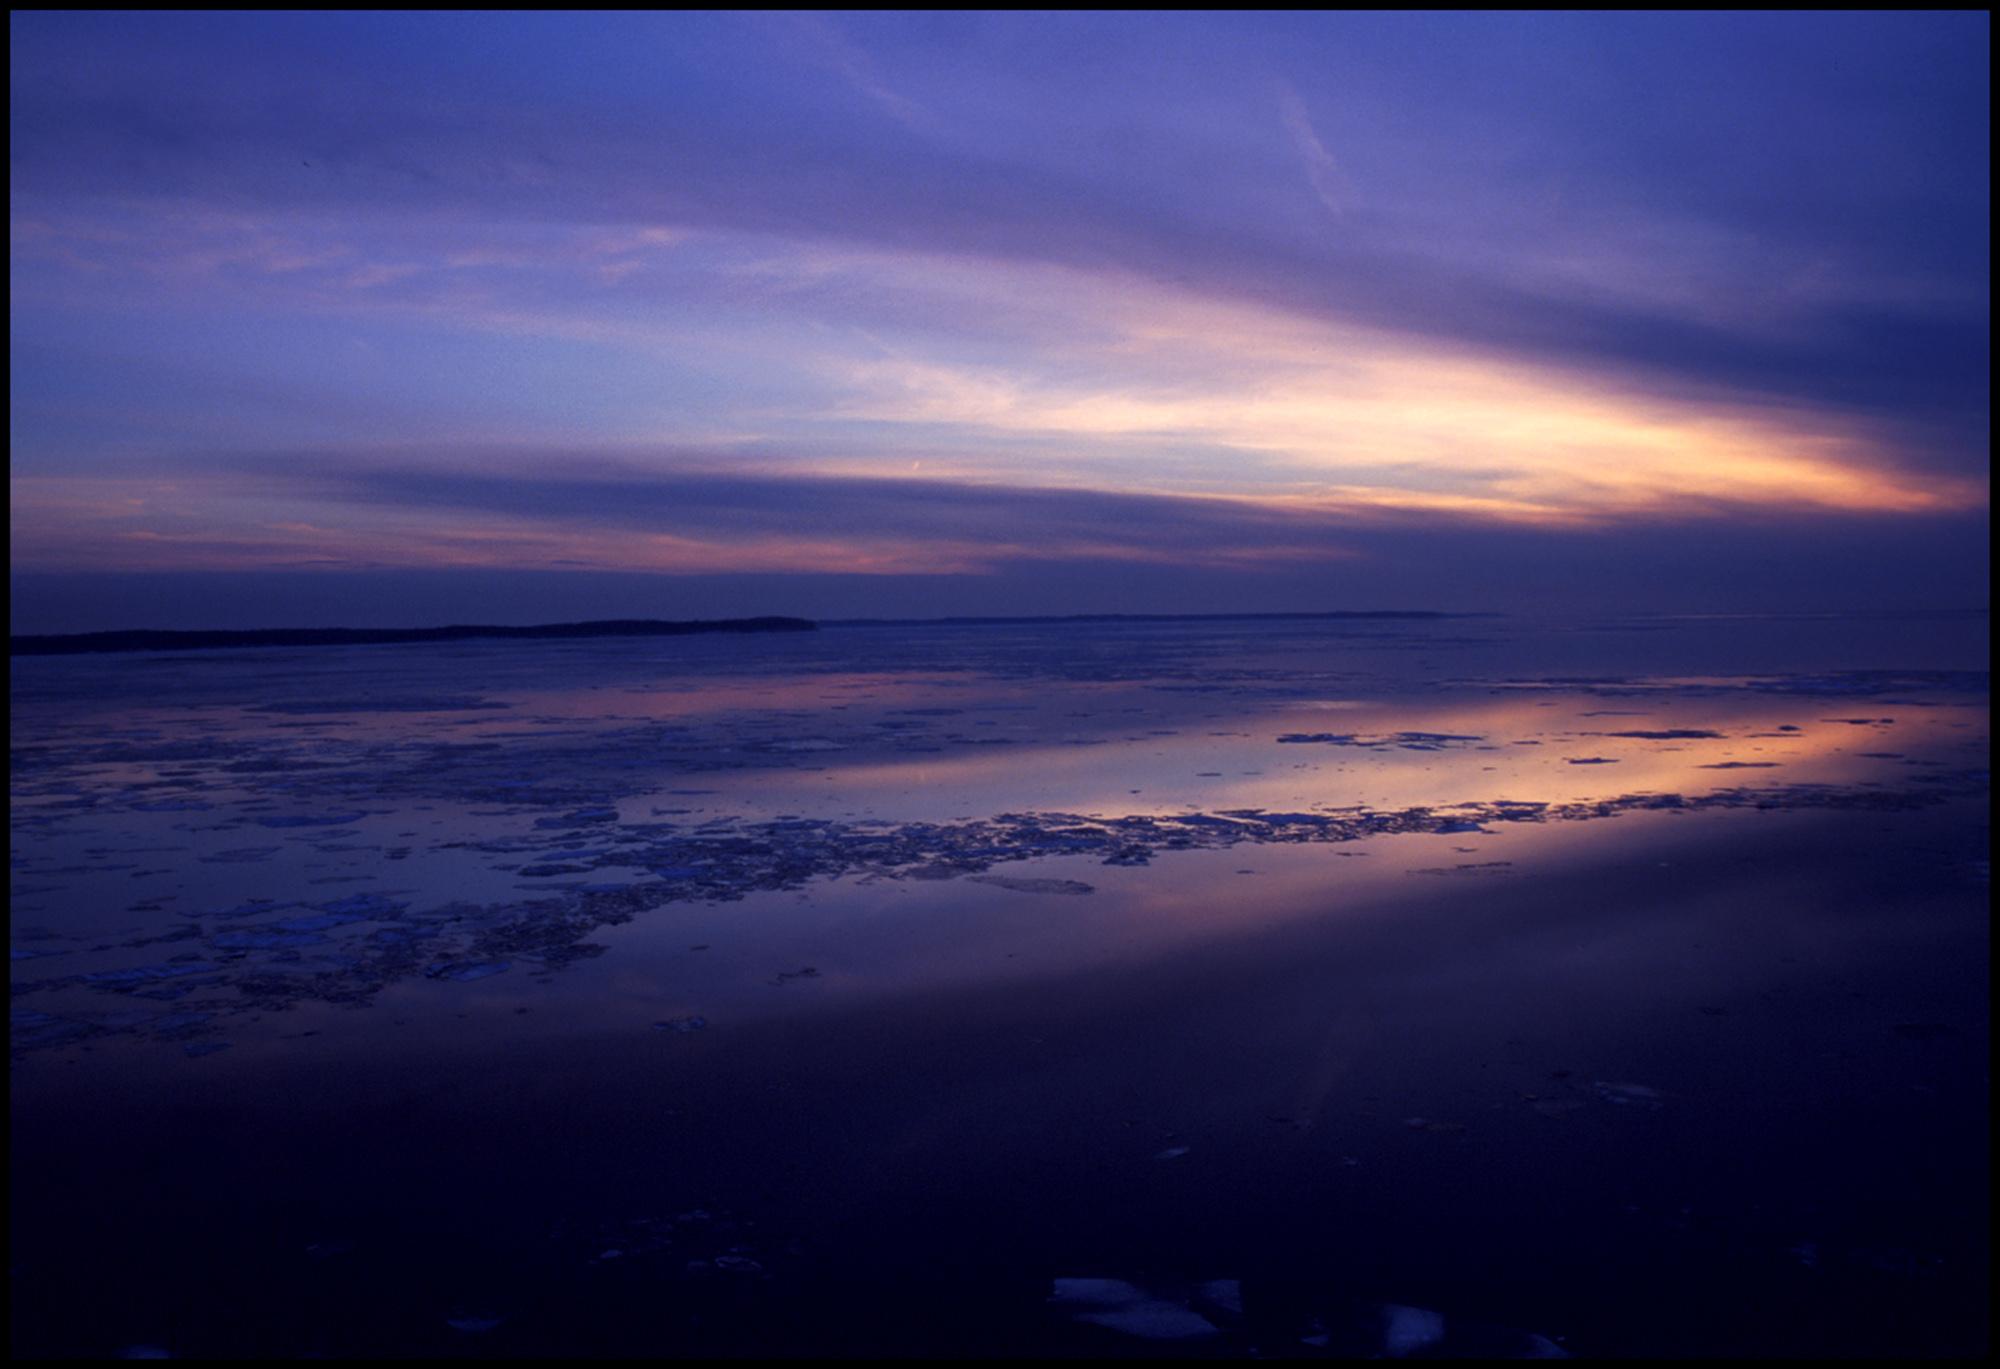 Icy Bay near Turkey Point